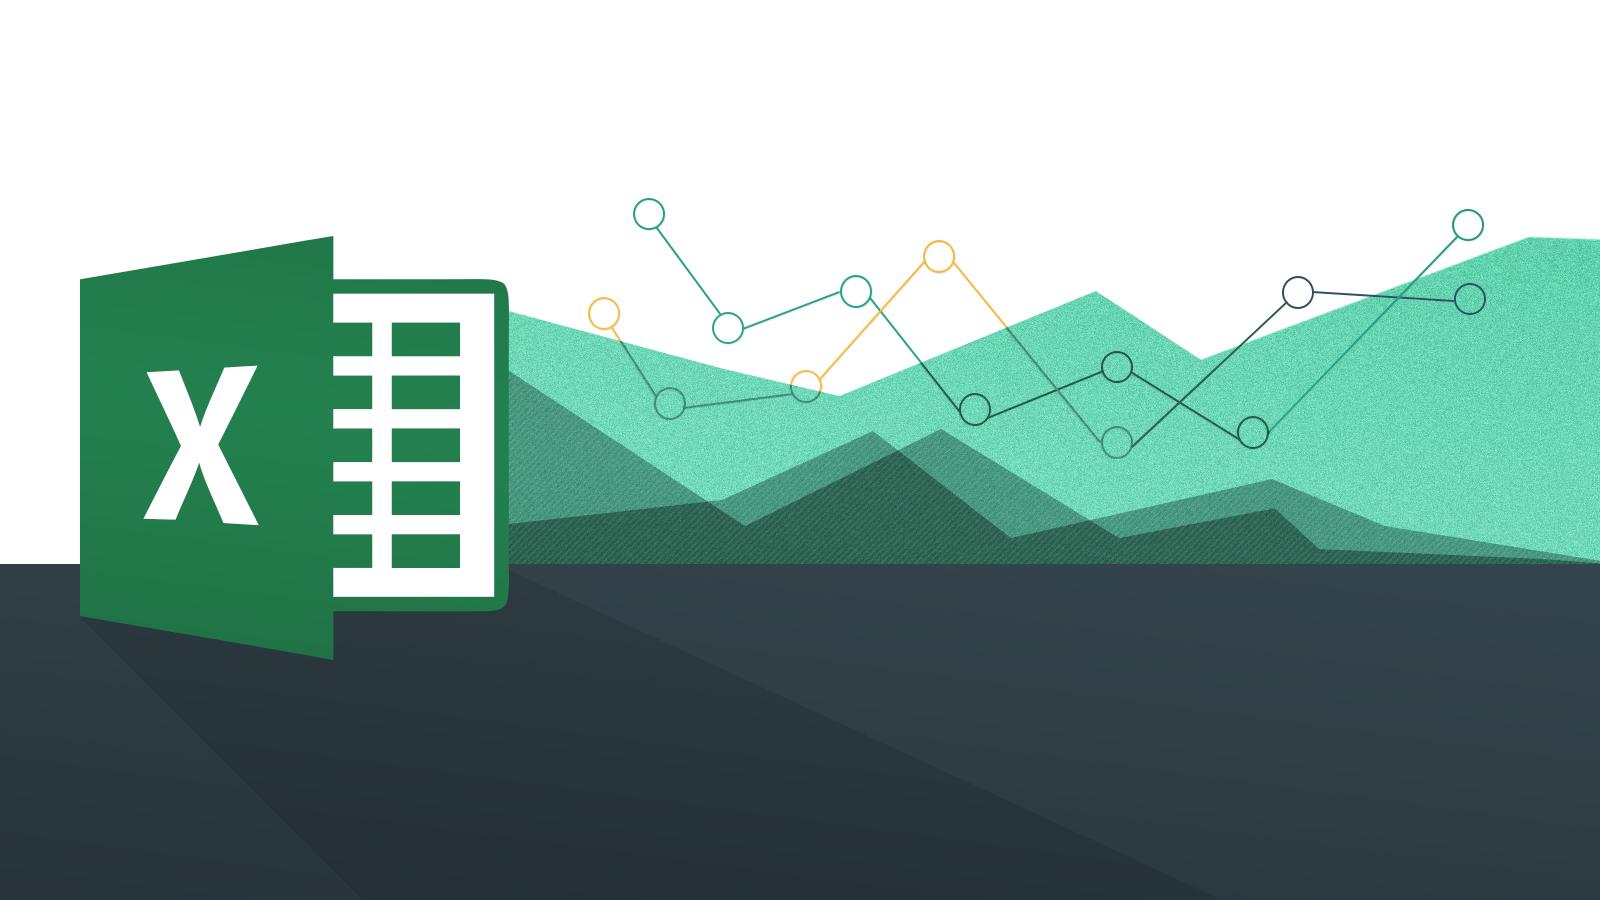 Apostila Excel atraves de exercicios